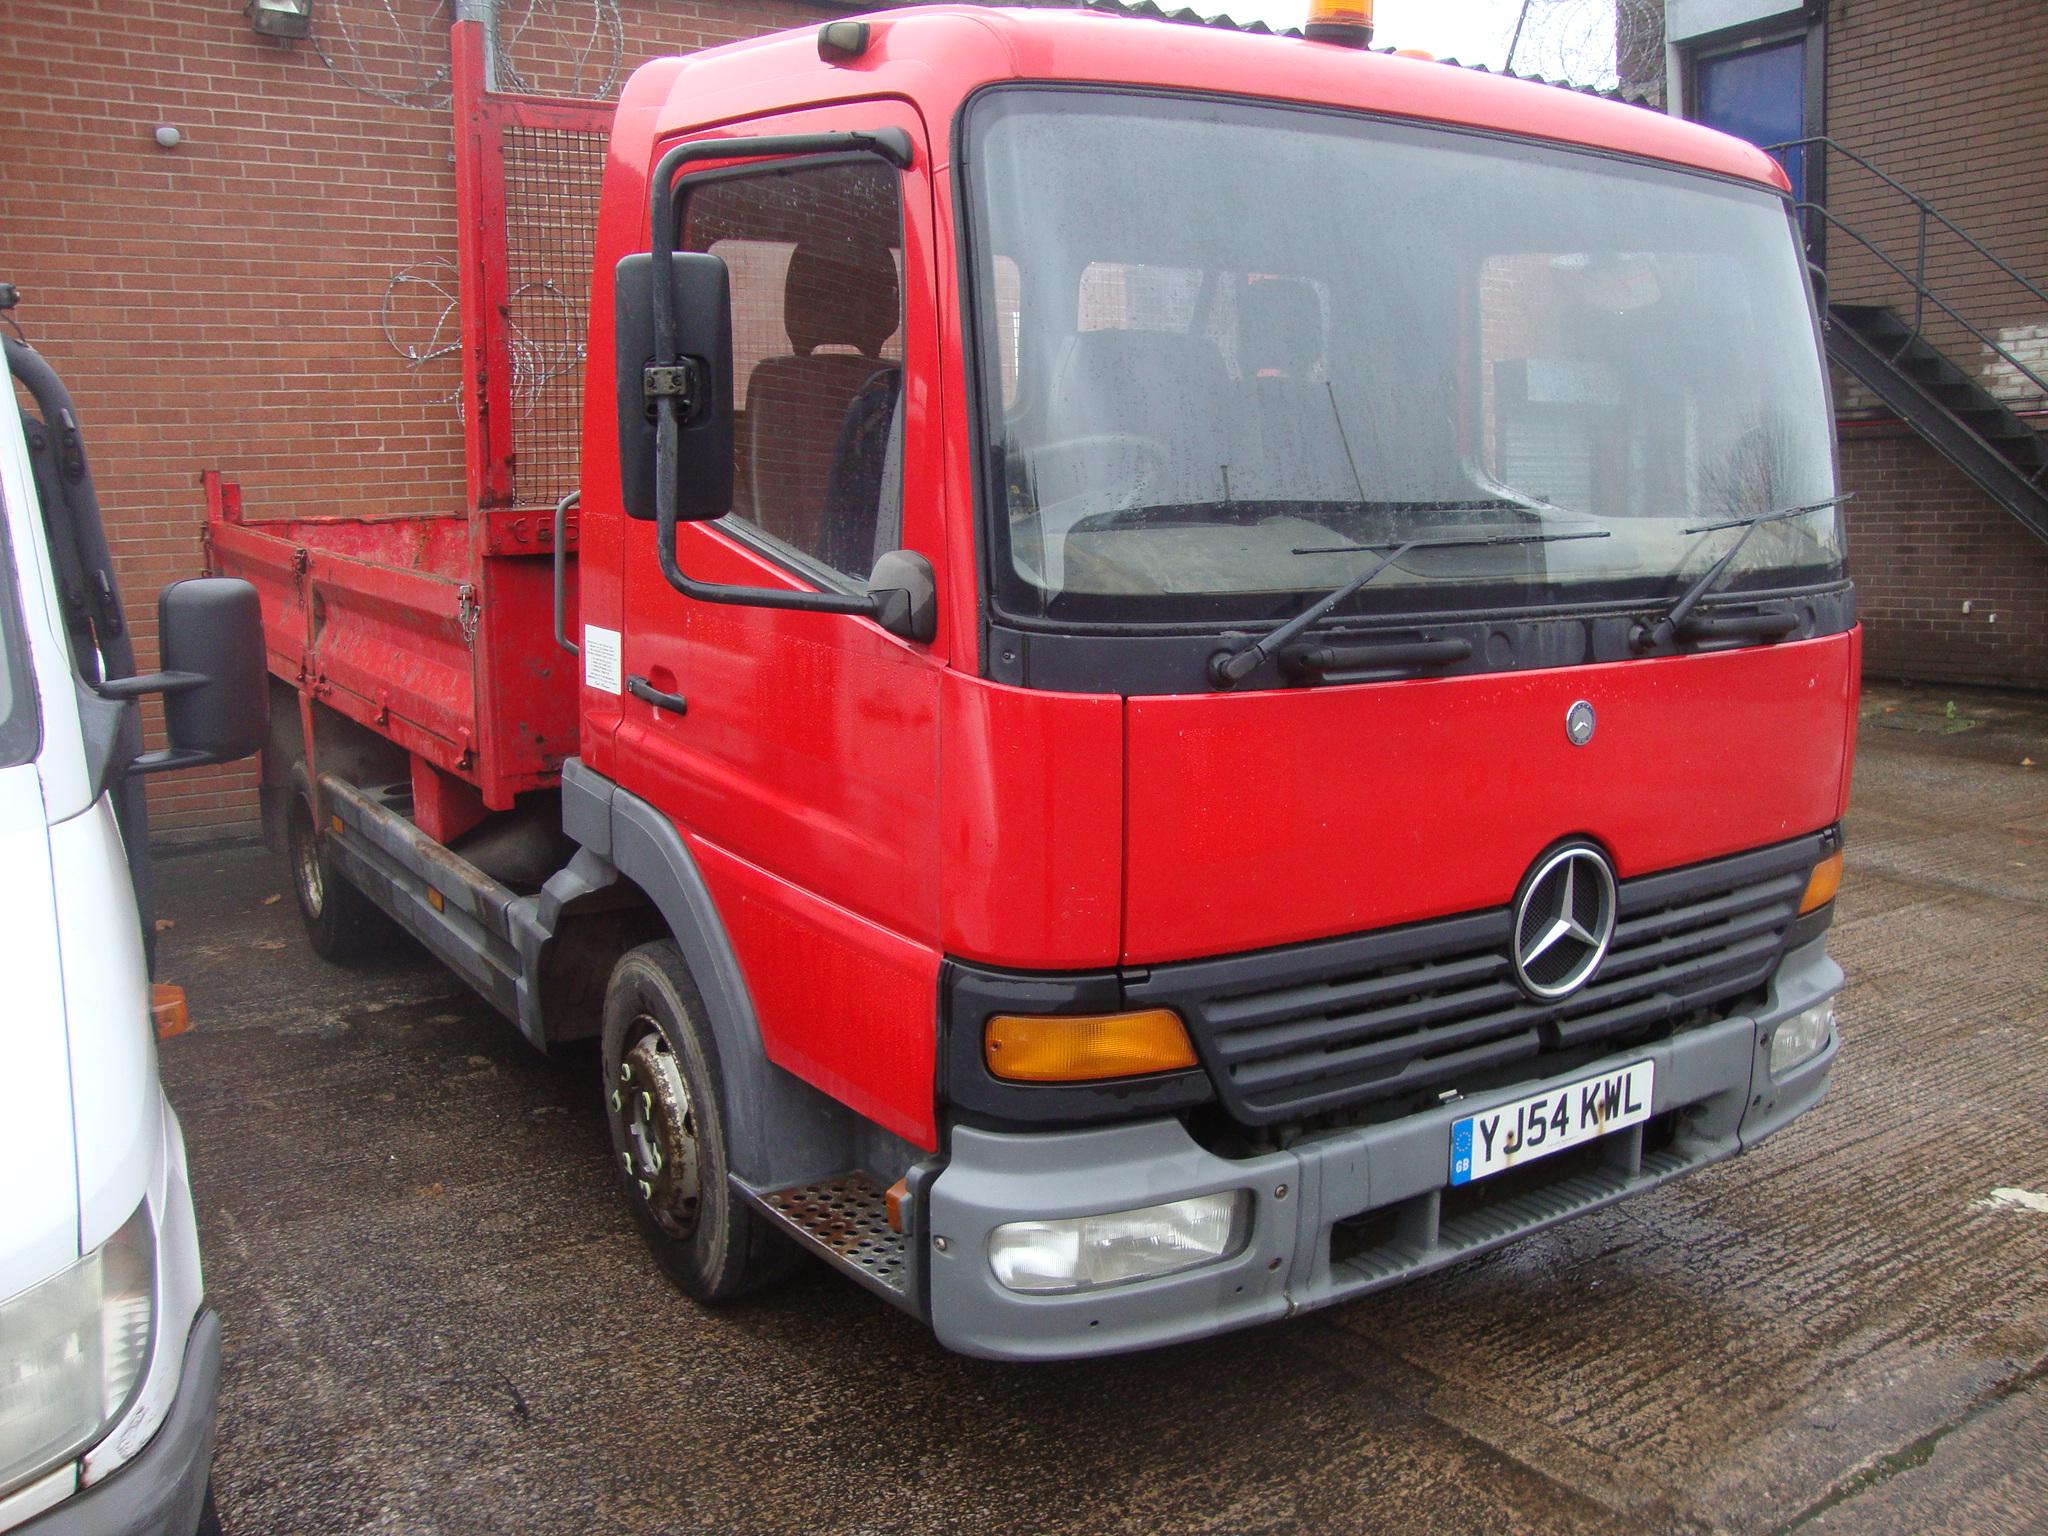 YJ54 KWL Mercedes Atego 815 tipper (7 5 ton), 6 speed manual gearbox